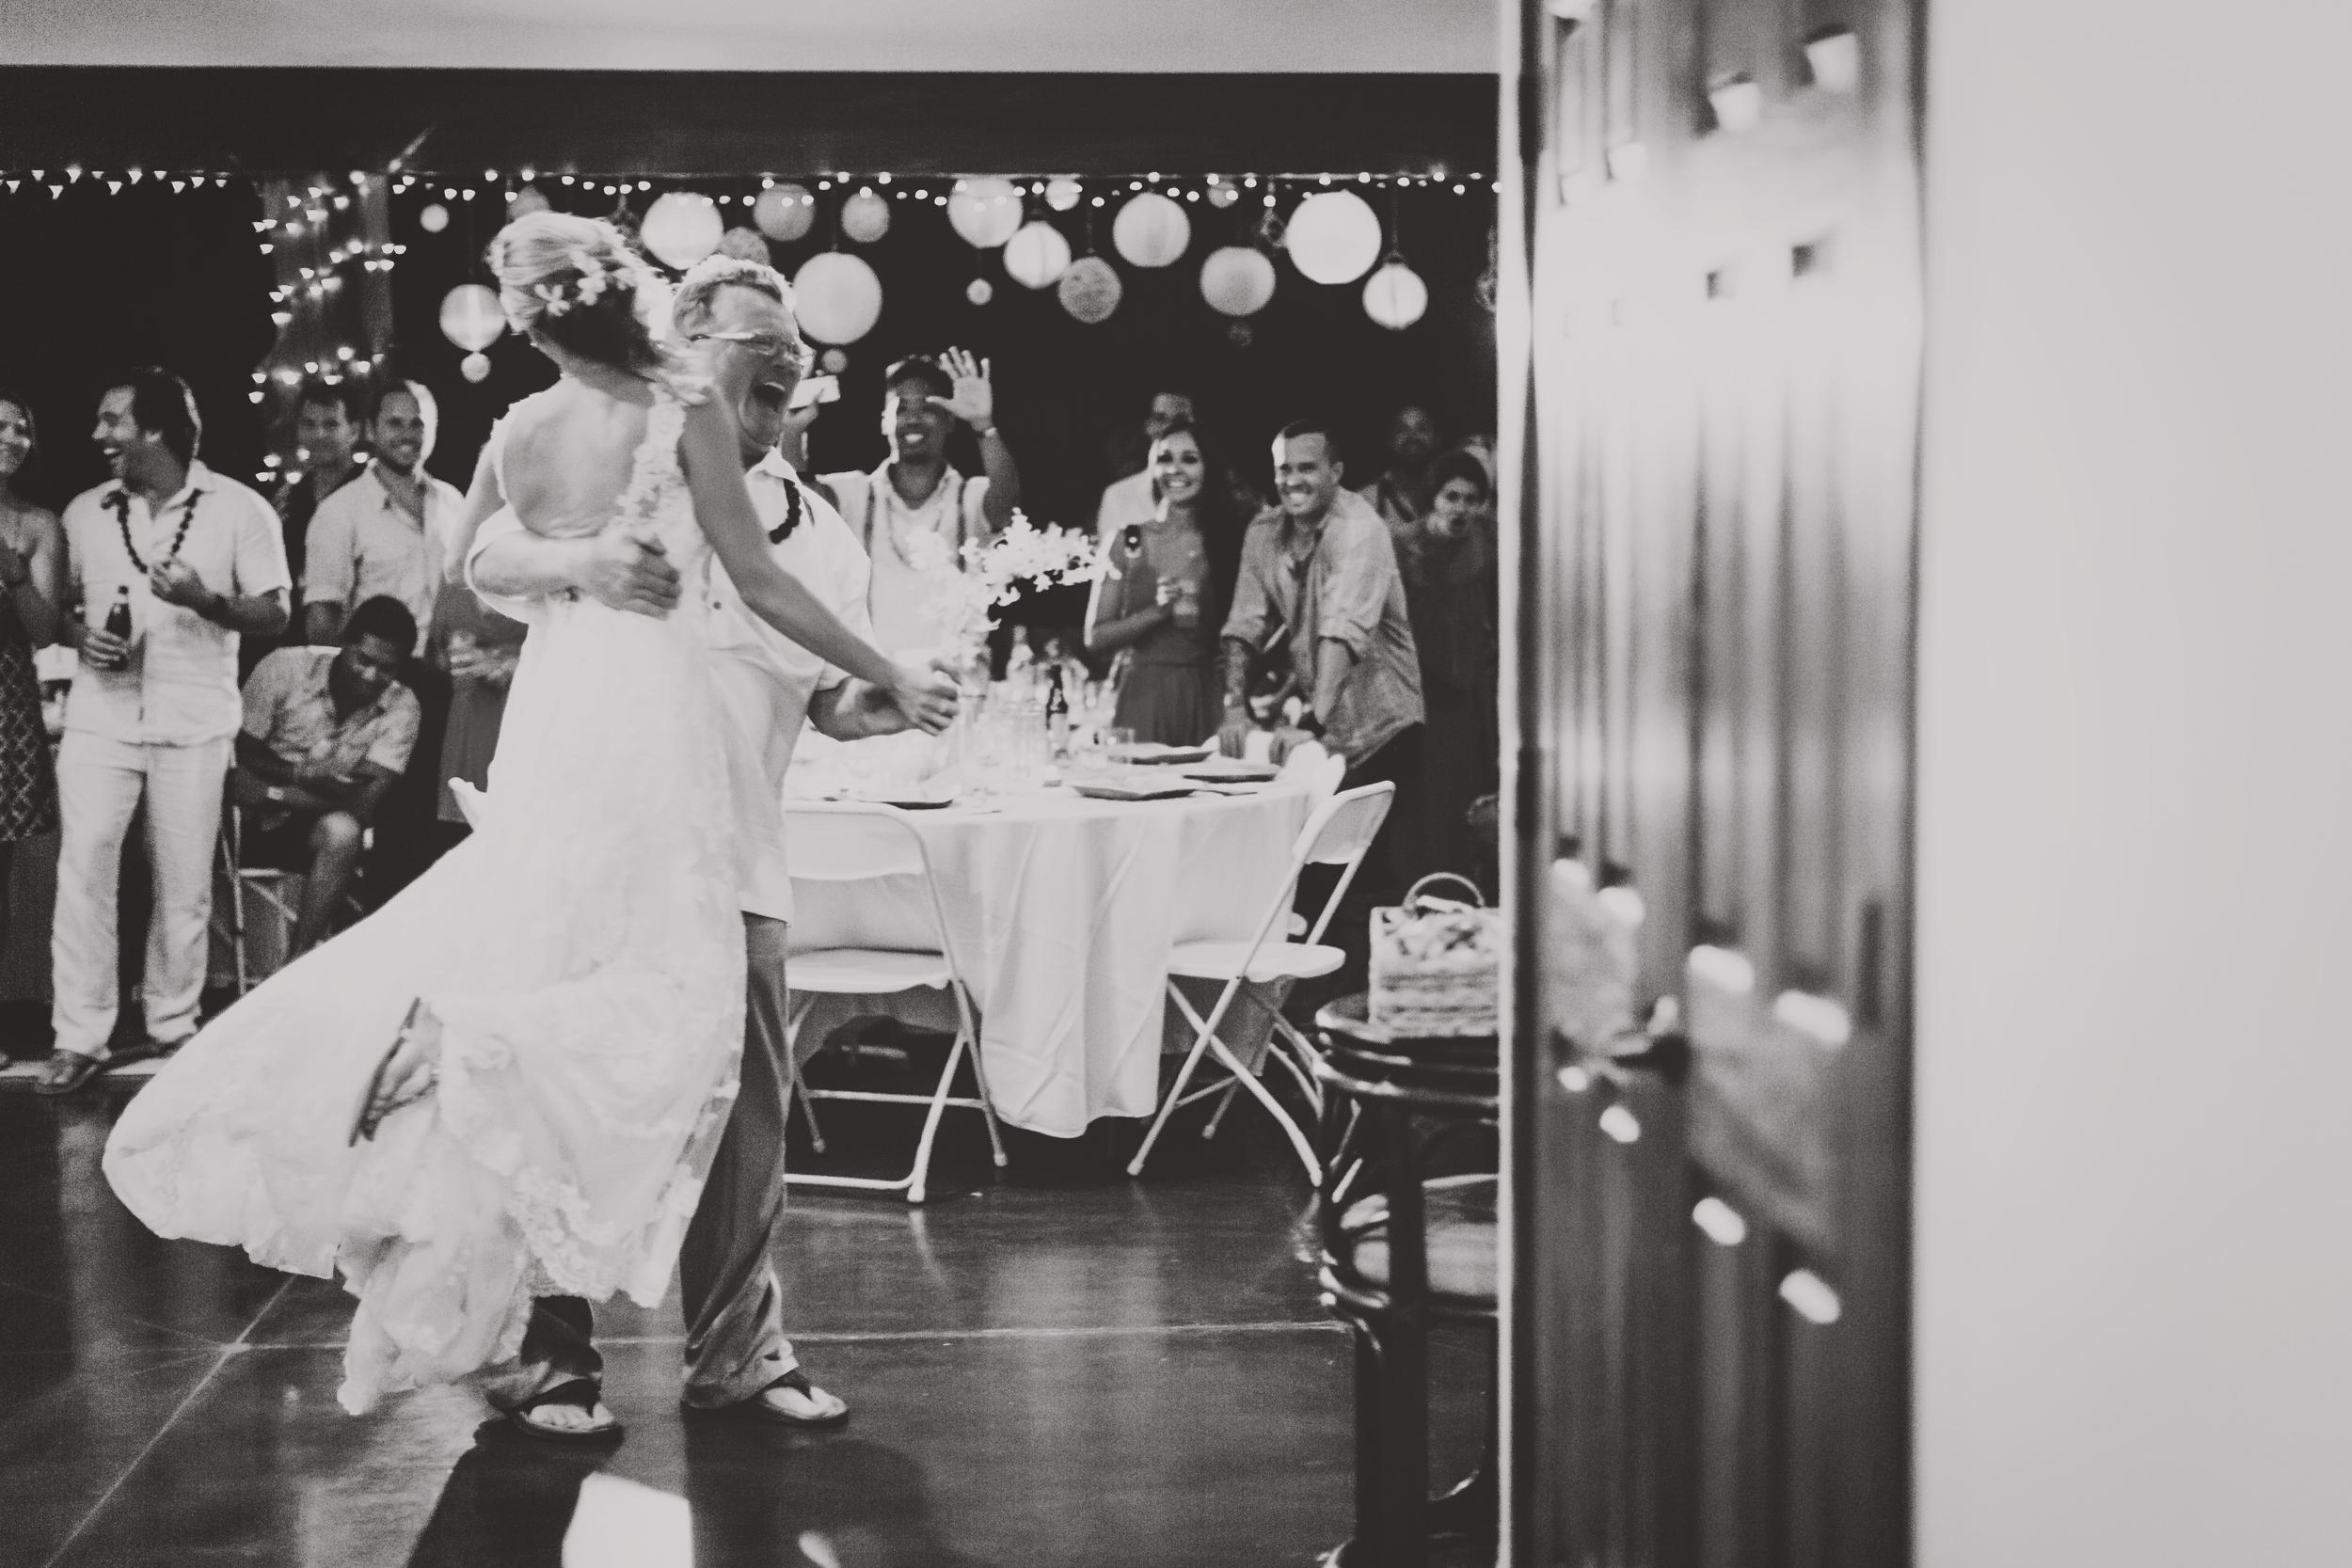 angie-diaz-photography-hawaii-wedding-photographer-kelli-jay-126.jpg